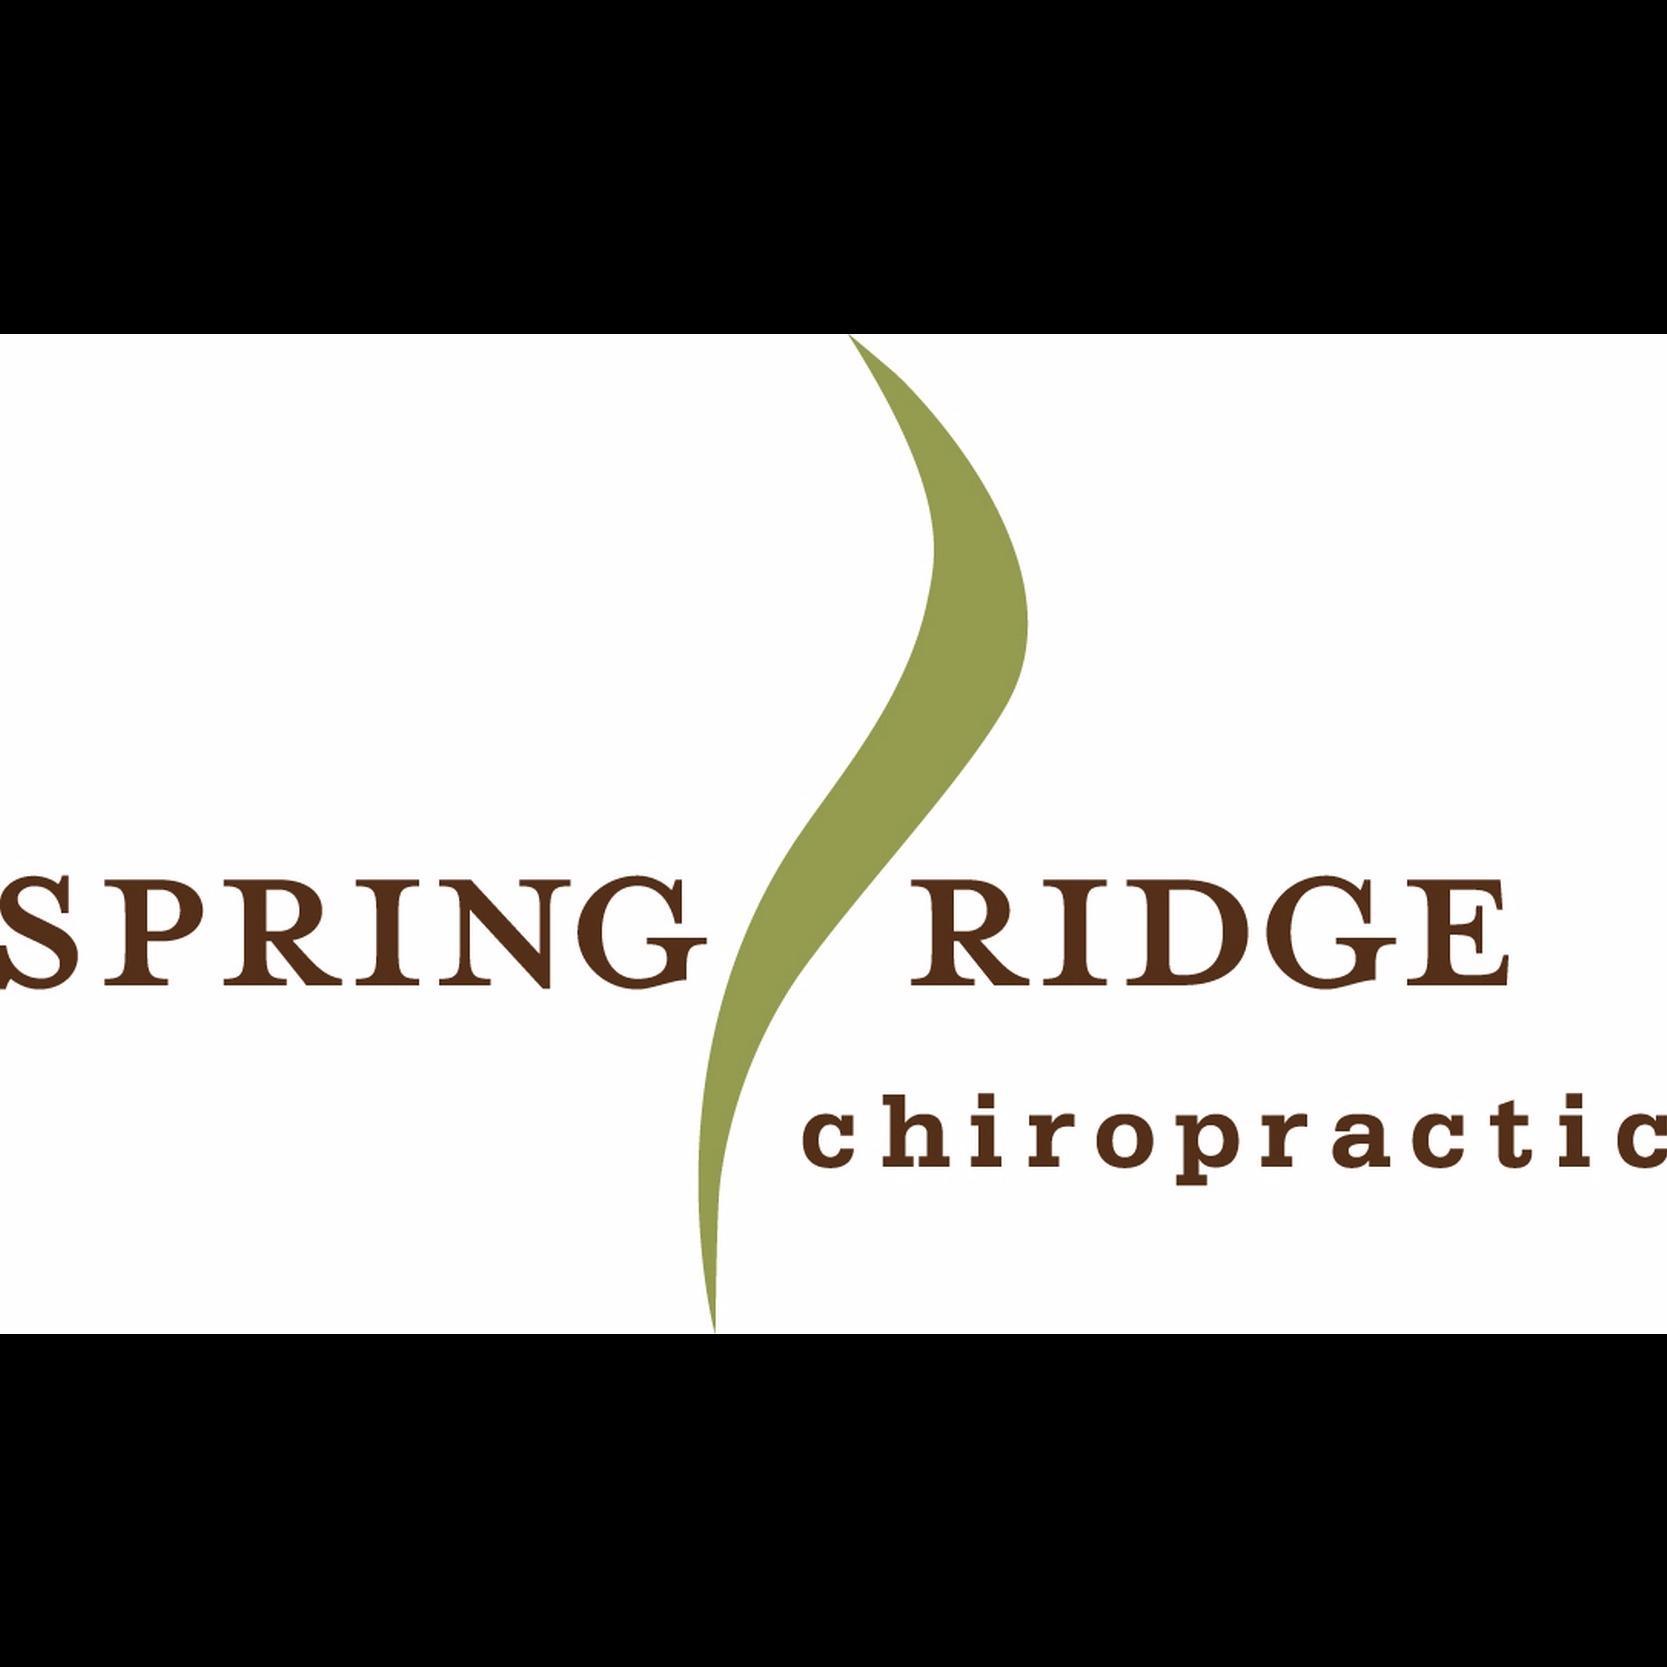 Spring Ridge Chiropractic - Frederick, MD - Chiropractors